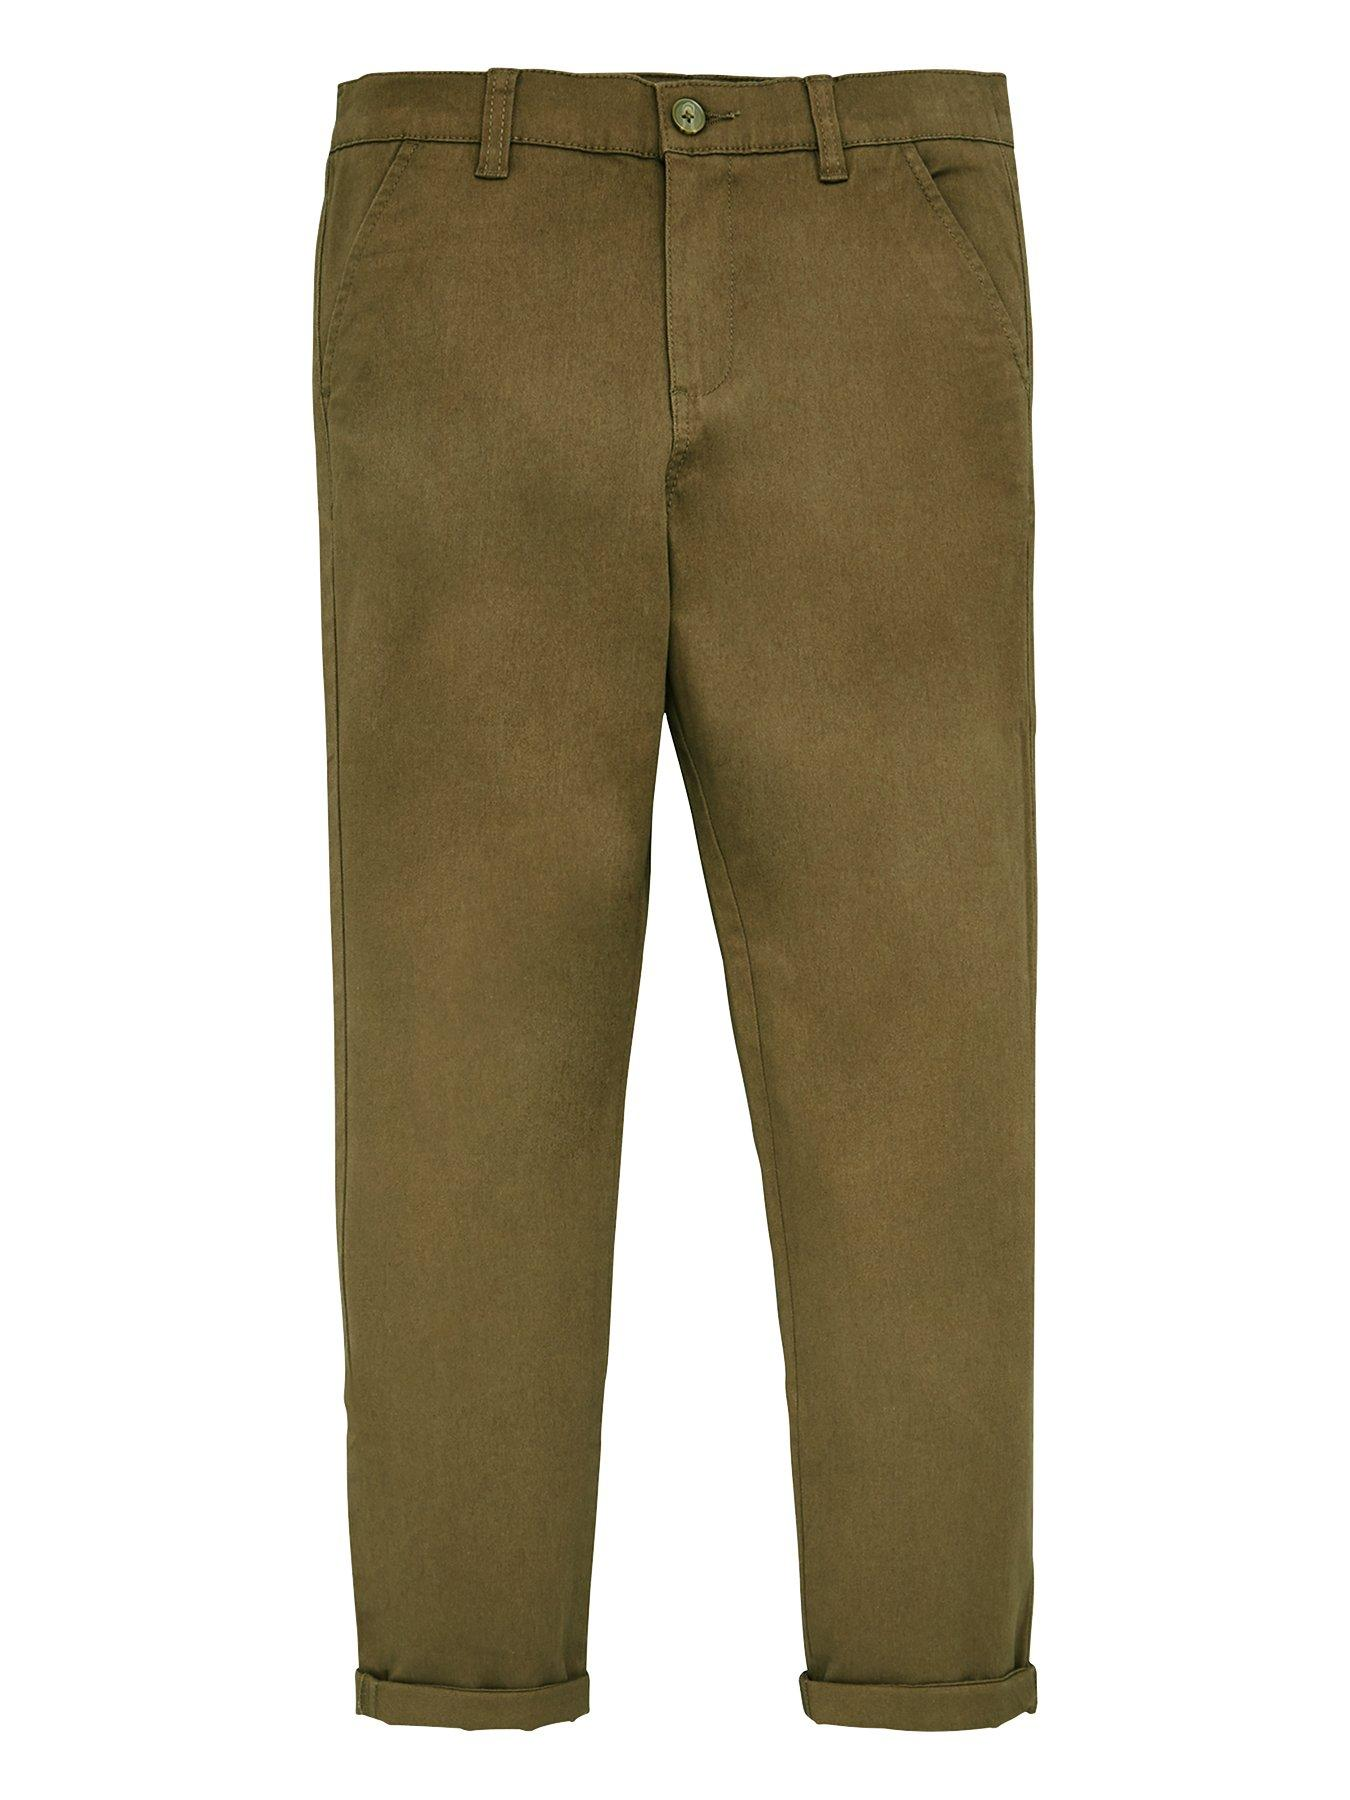 NEW Attire Designer Boys Multi-Pocket Belted Cotton Cargo Utility Shorts 2-5yrs